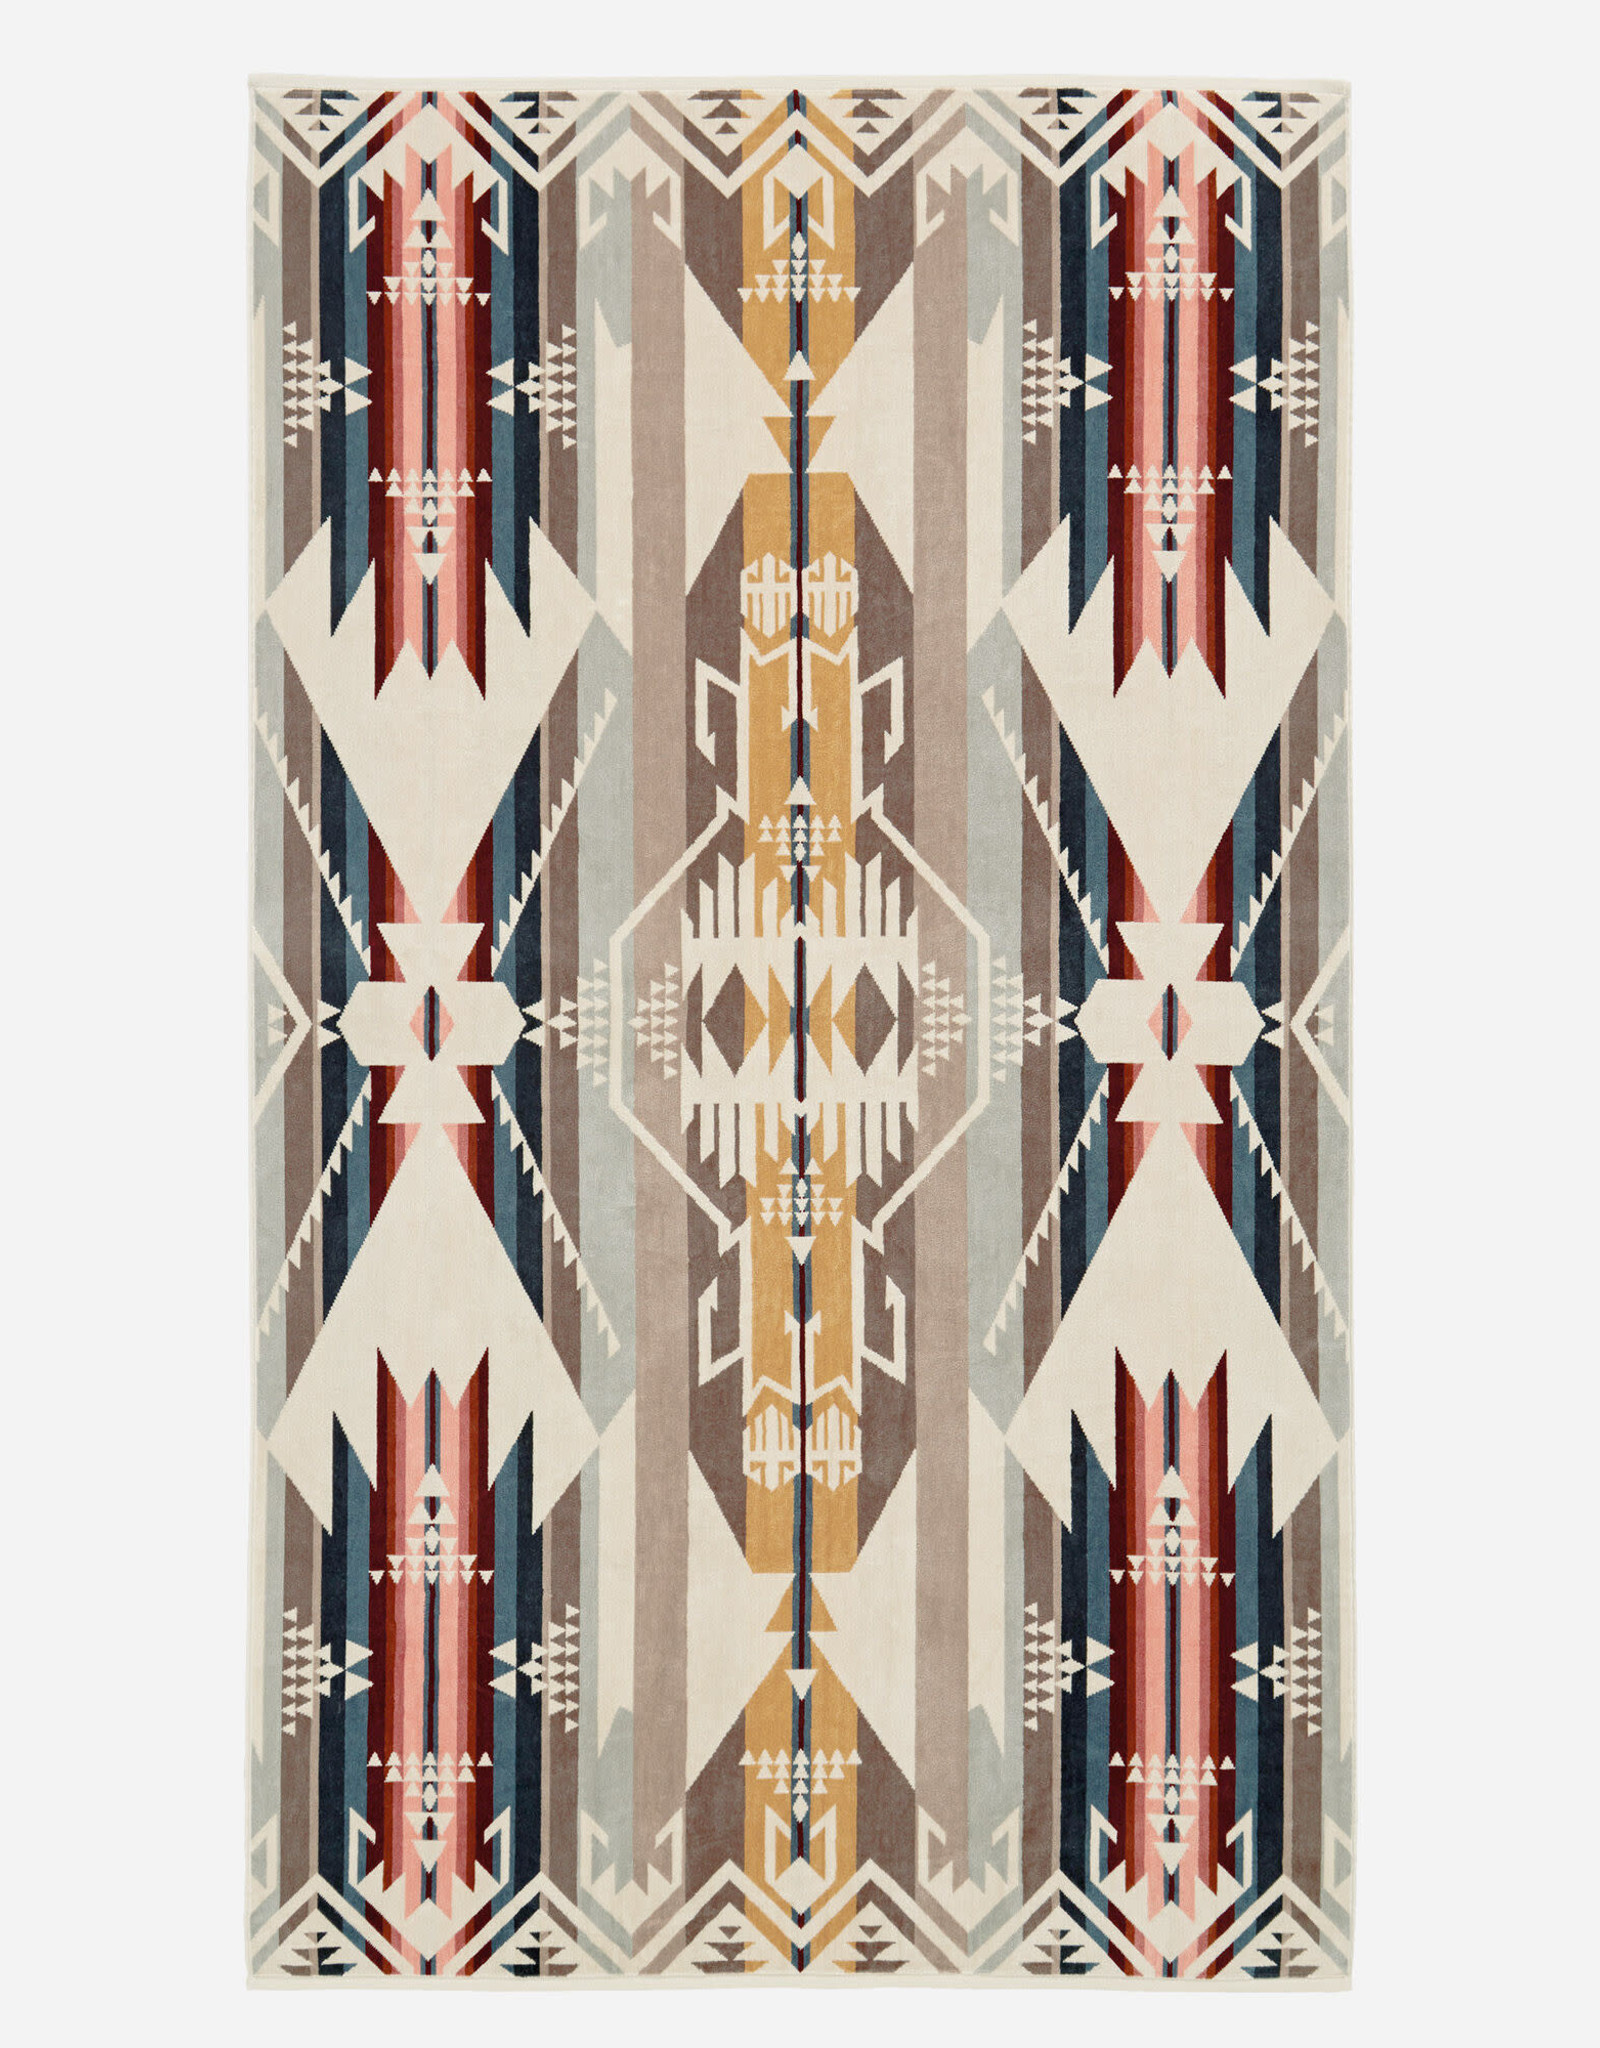 PENDLETON White Sands Tan Oversized Towel